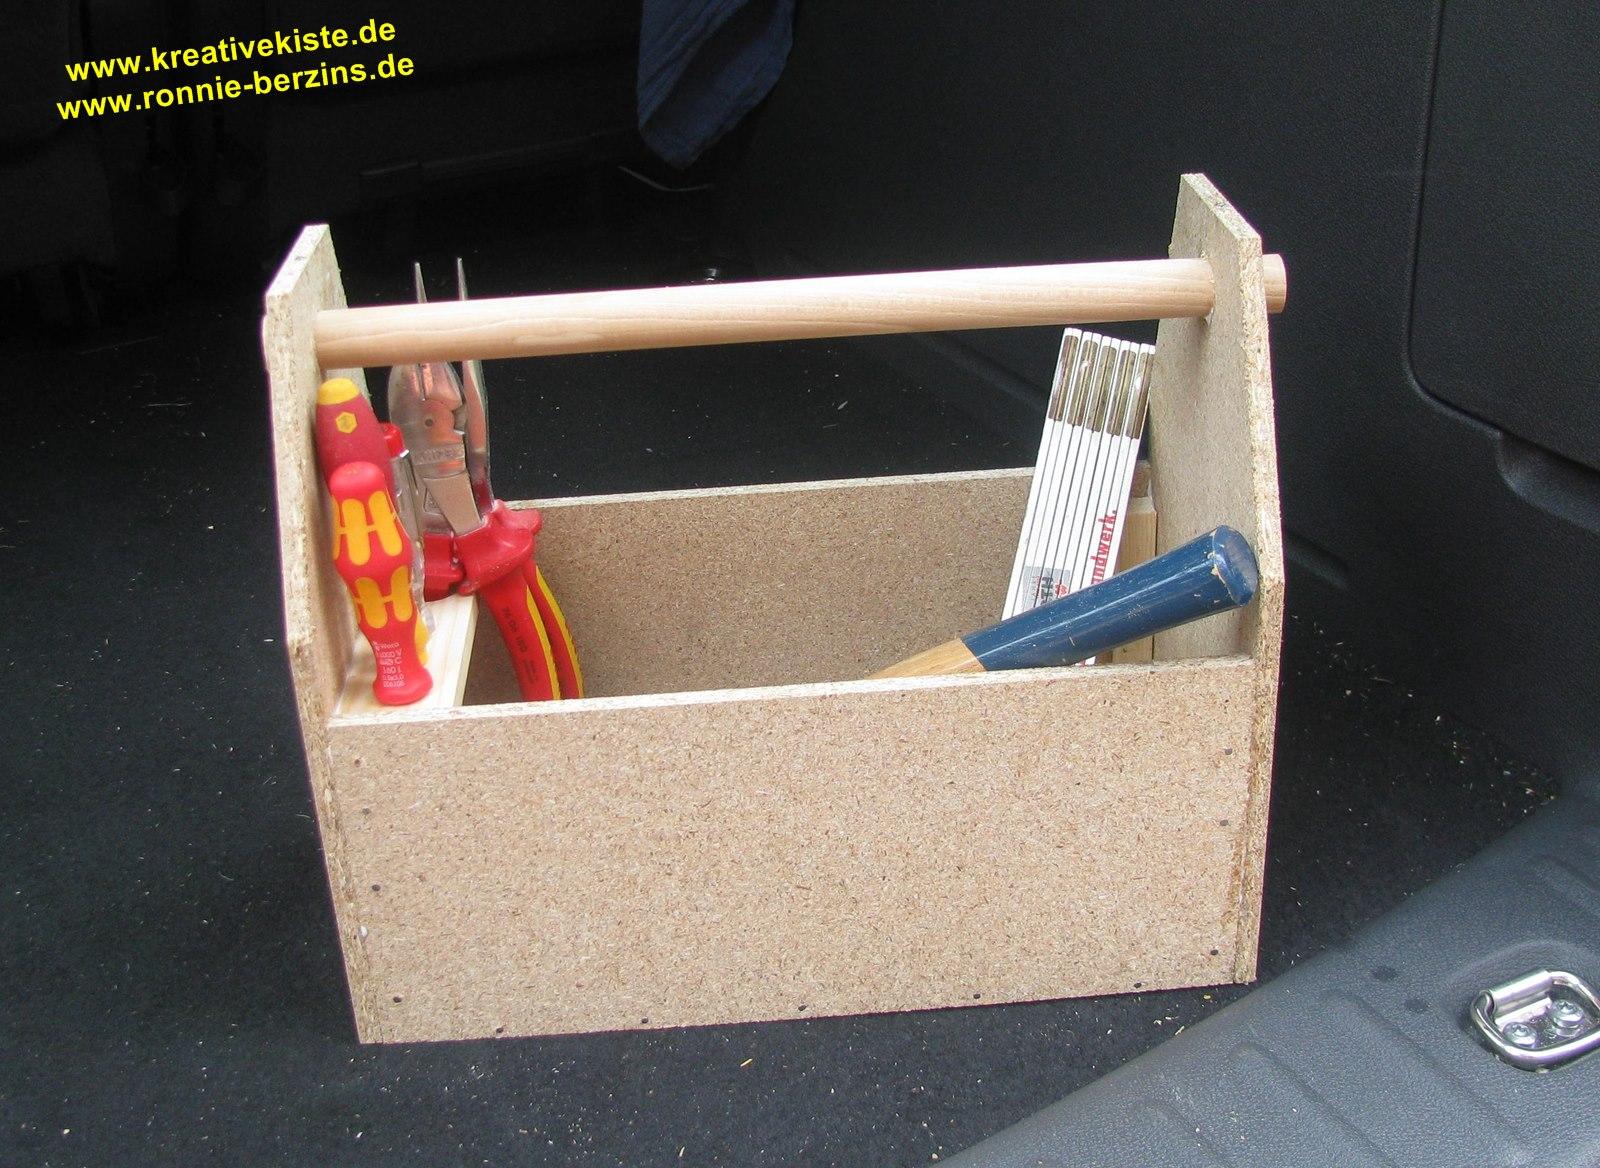 kreative kiste werkzeug kiste selber bauen